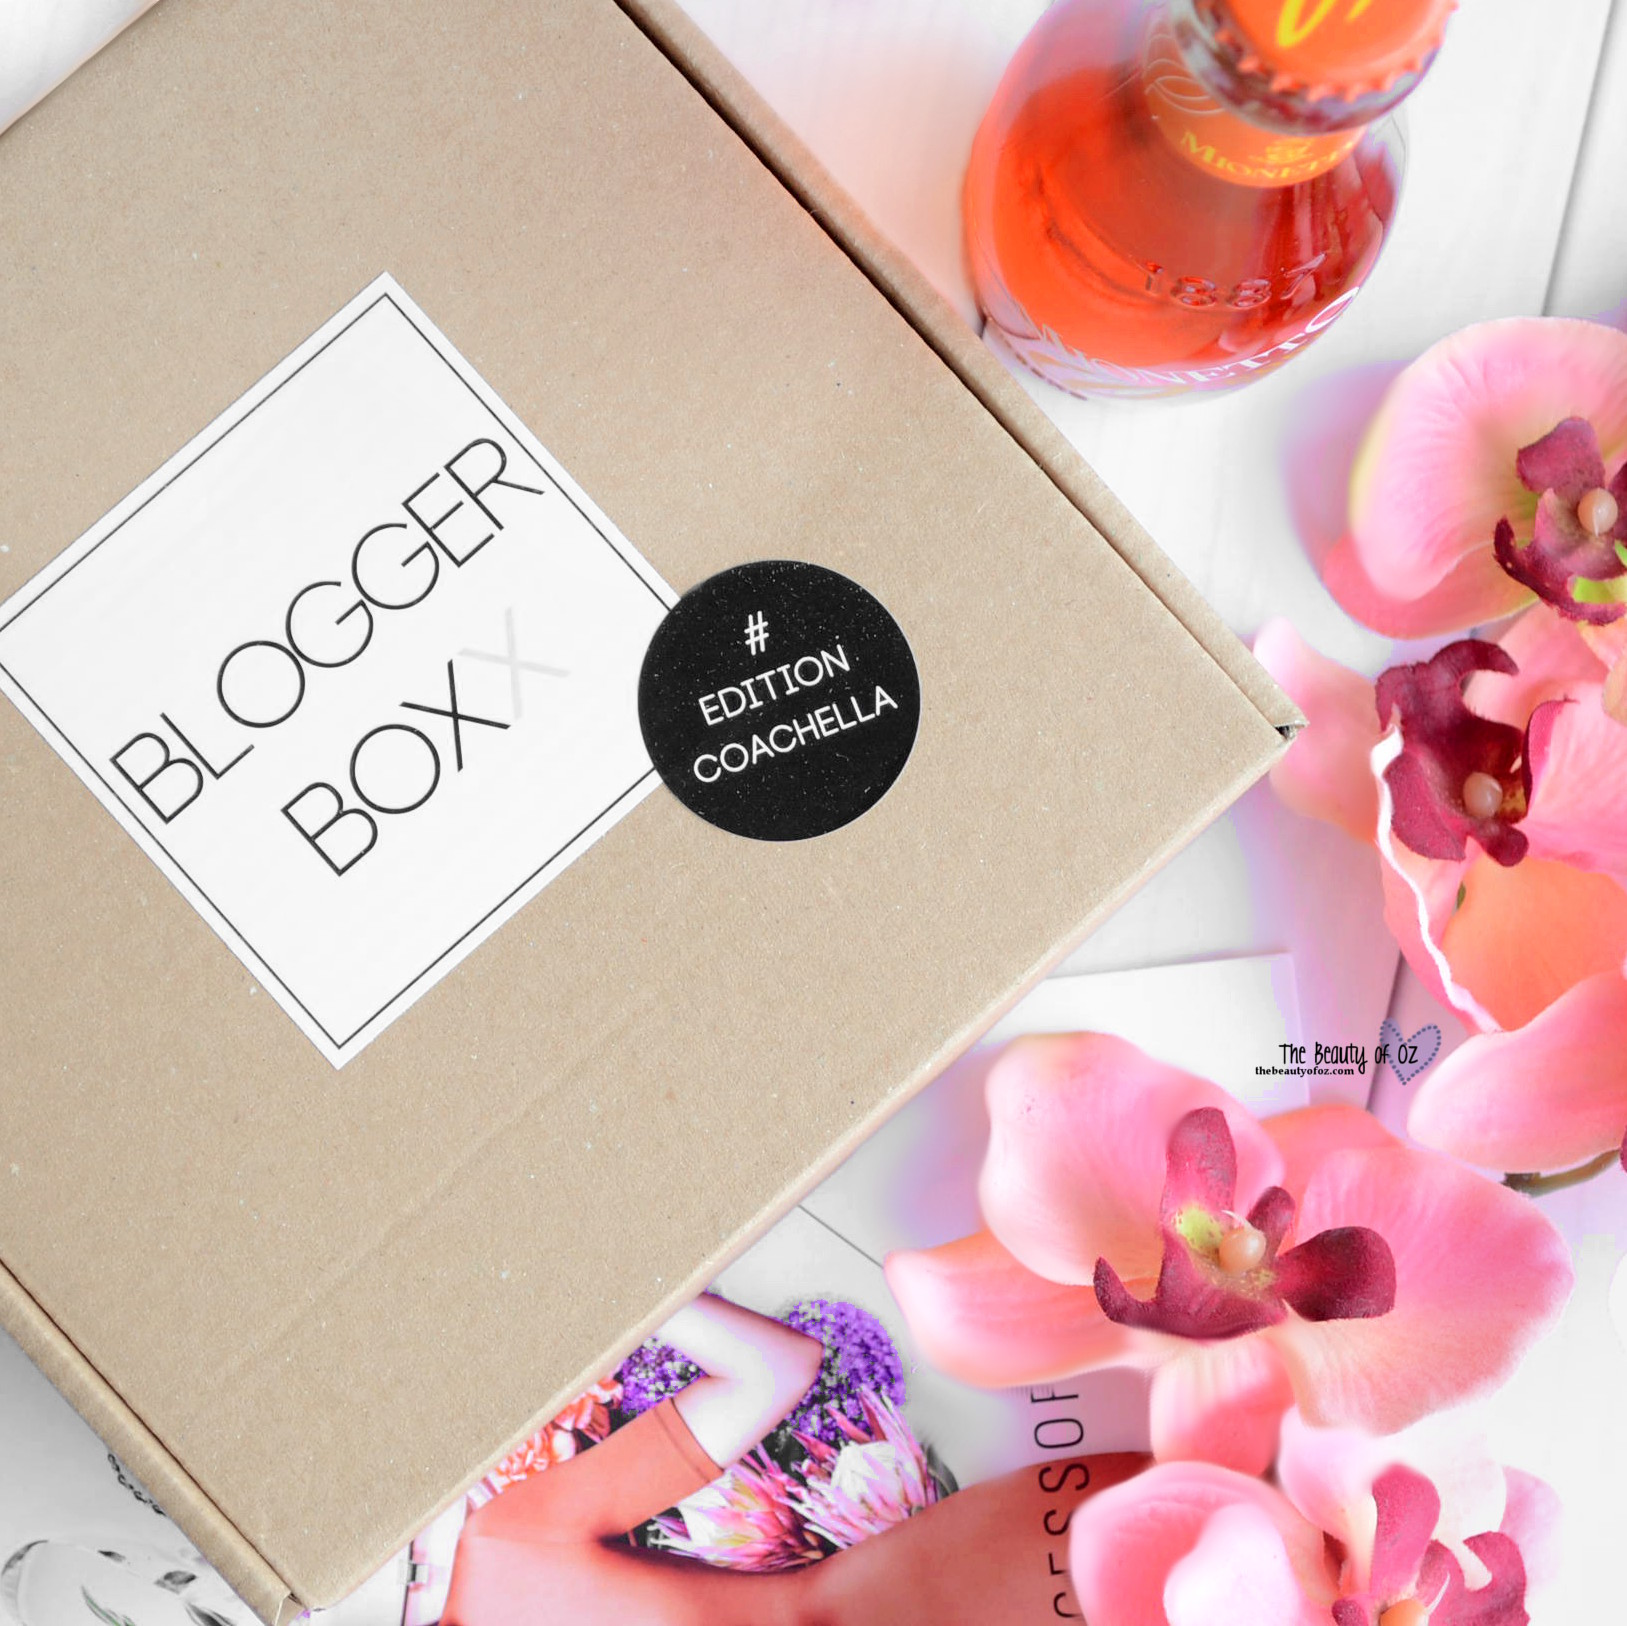 BloggerBoxx #EditionCoachella